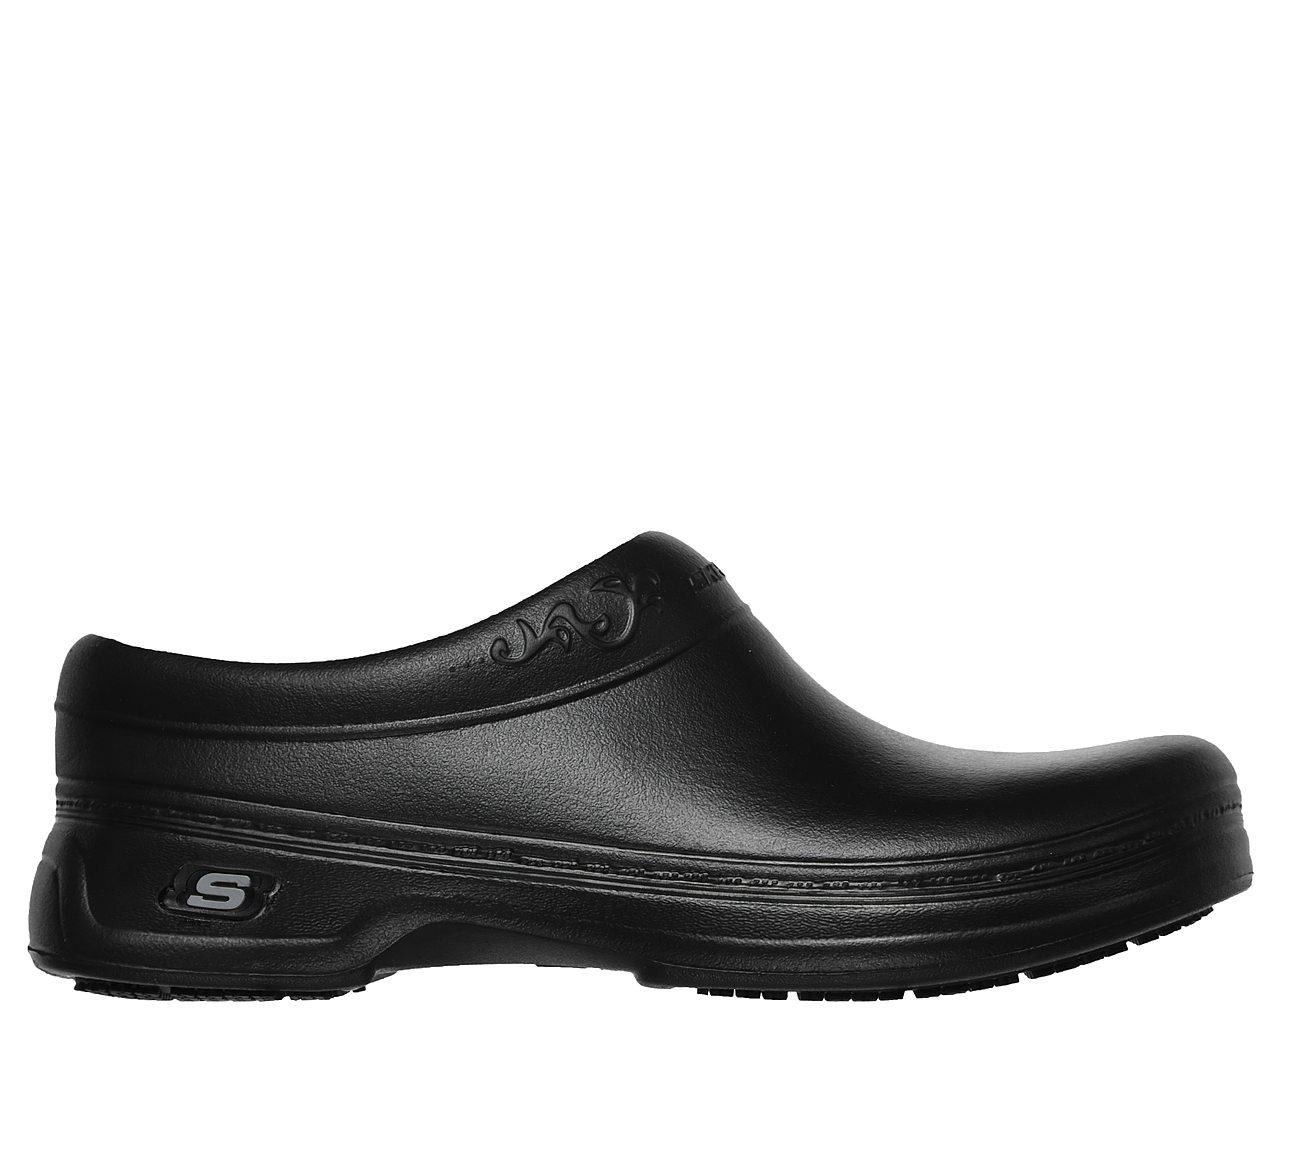 SKECHERS Work: Oswald - Clara Work Shoes